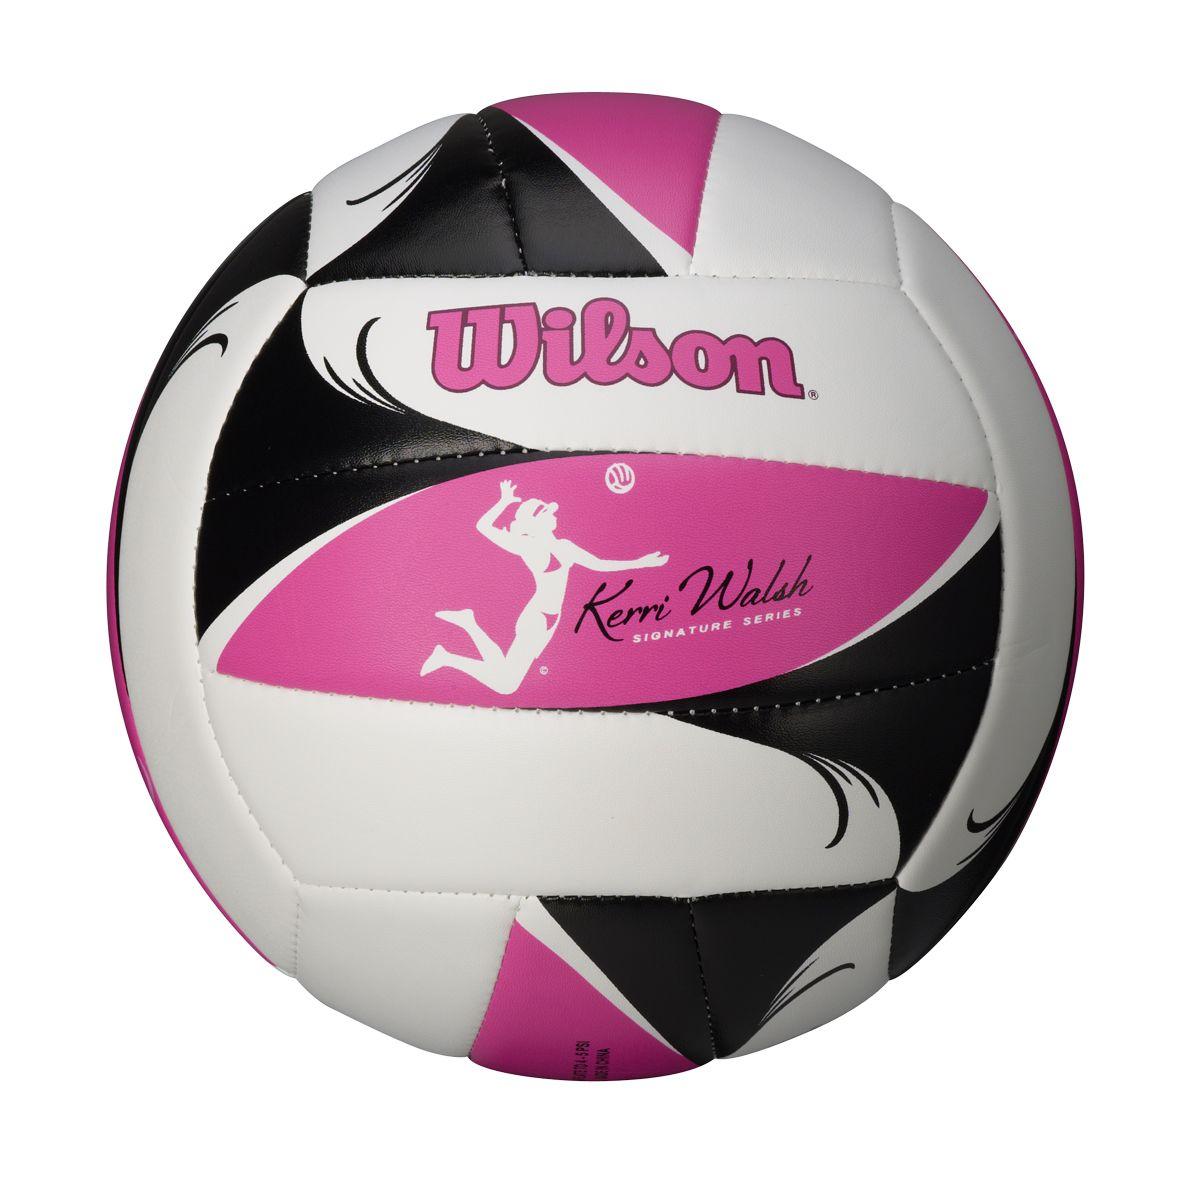 Wilson Kerri Walsh Signature Series Volleyball Kerri Walsh Volleyball Sport Volleyball